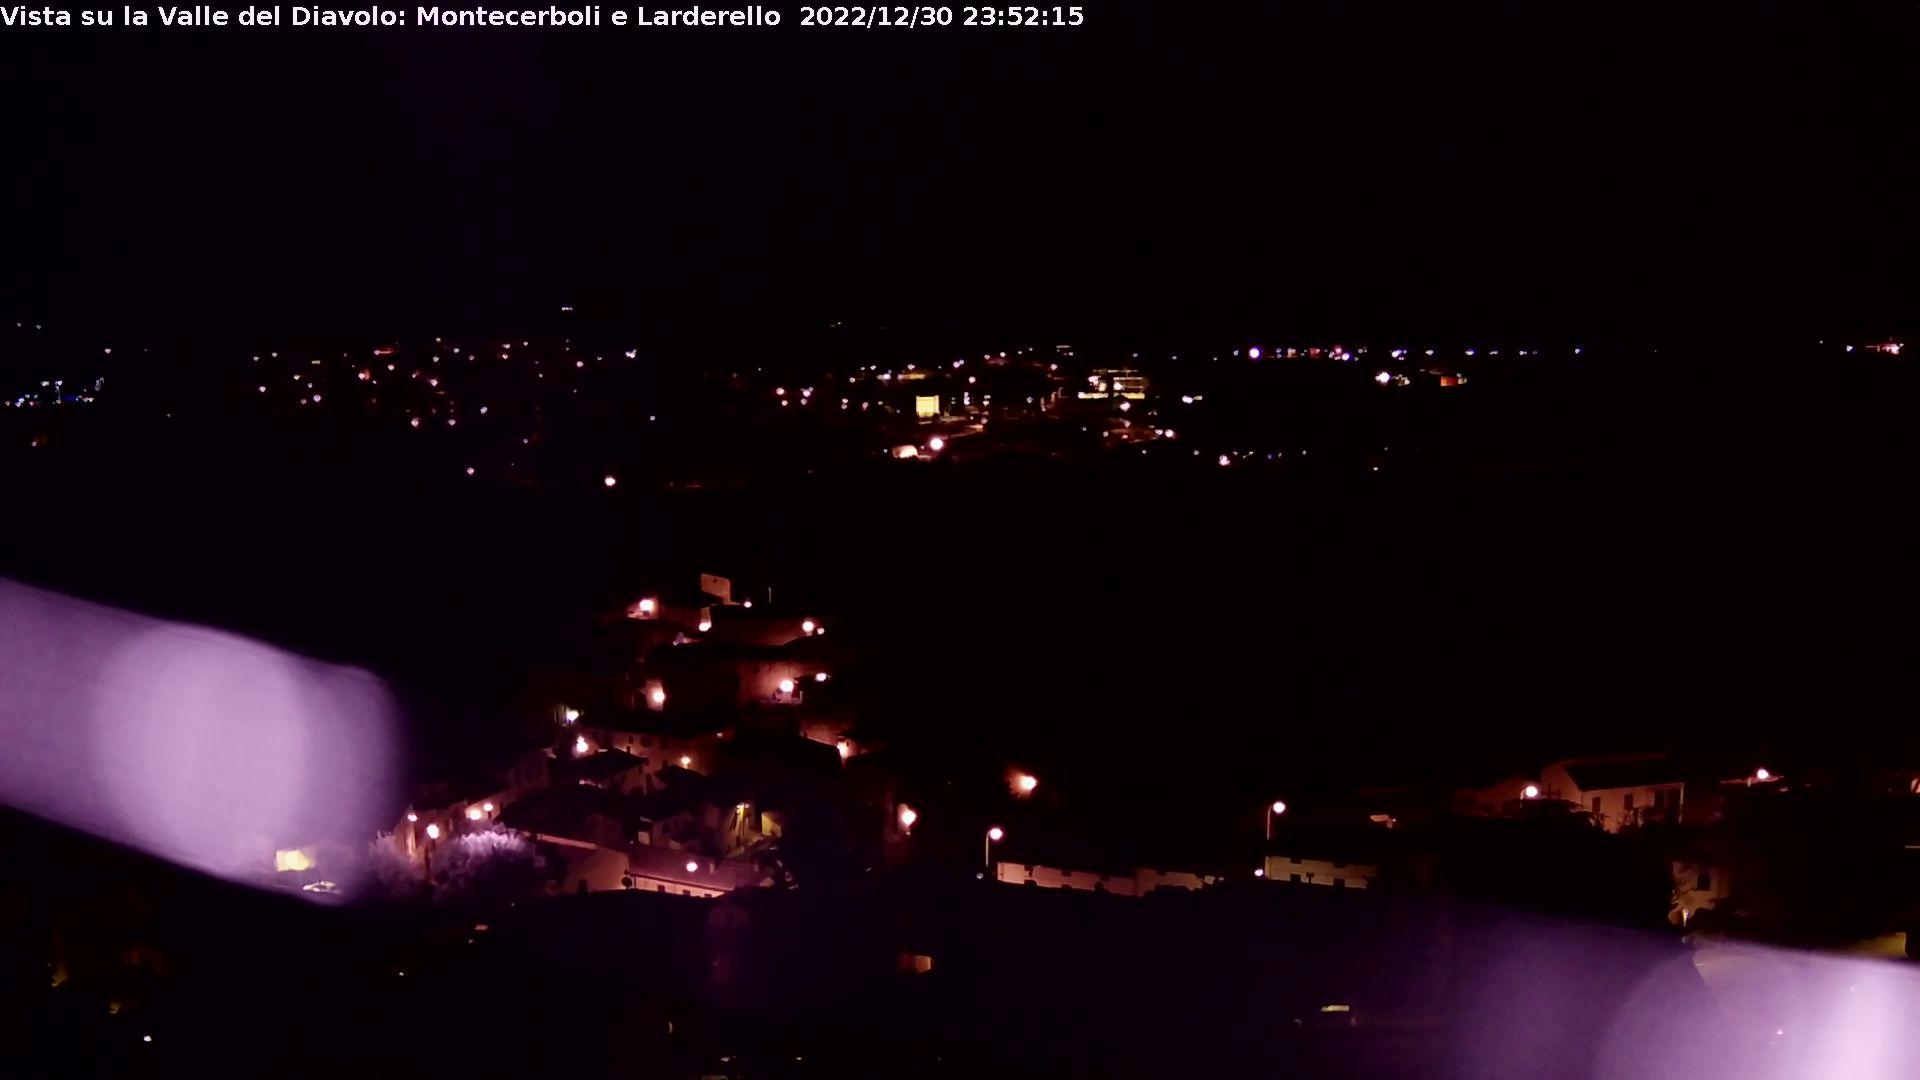 Webcam Colline Metallifere Larderello Castelnuovo Montecerboli